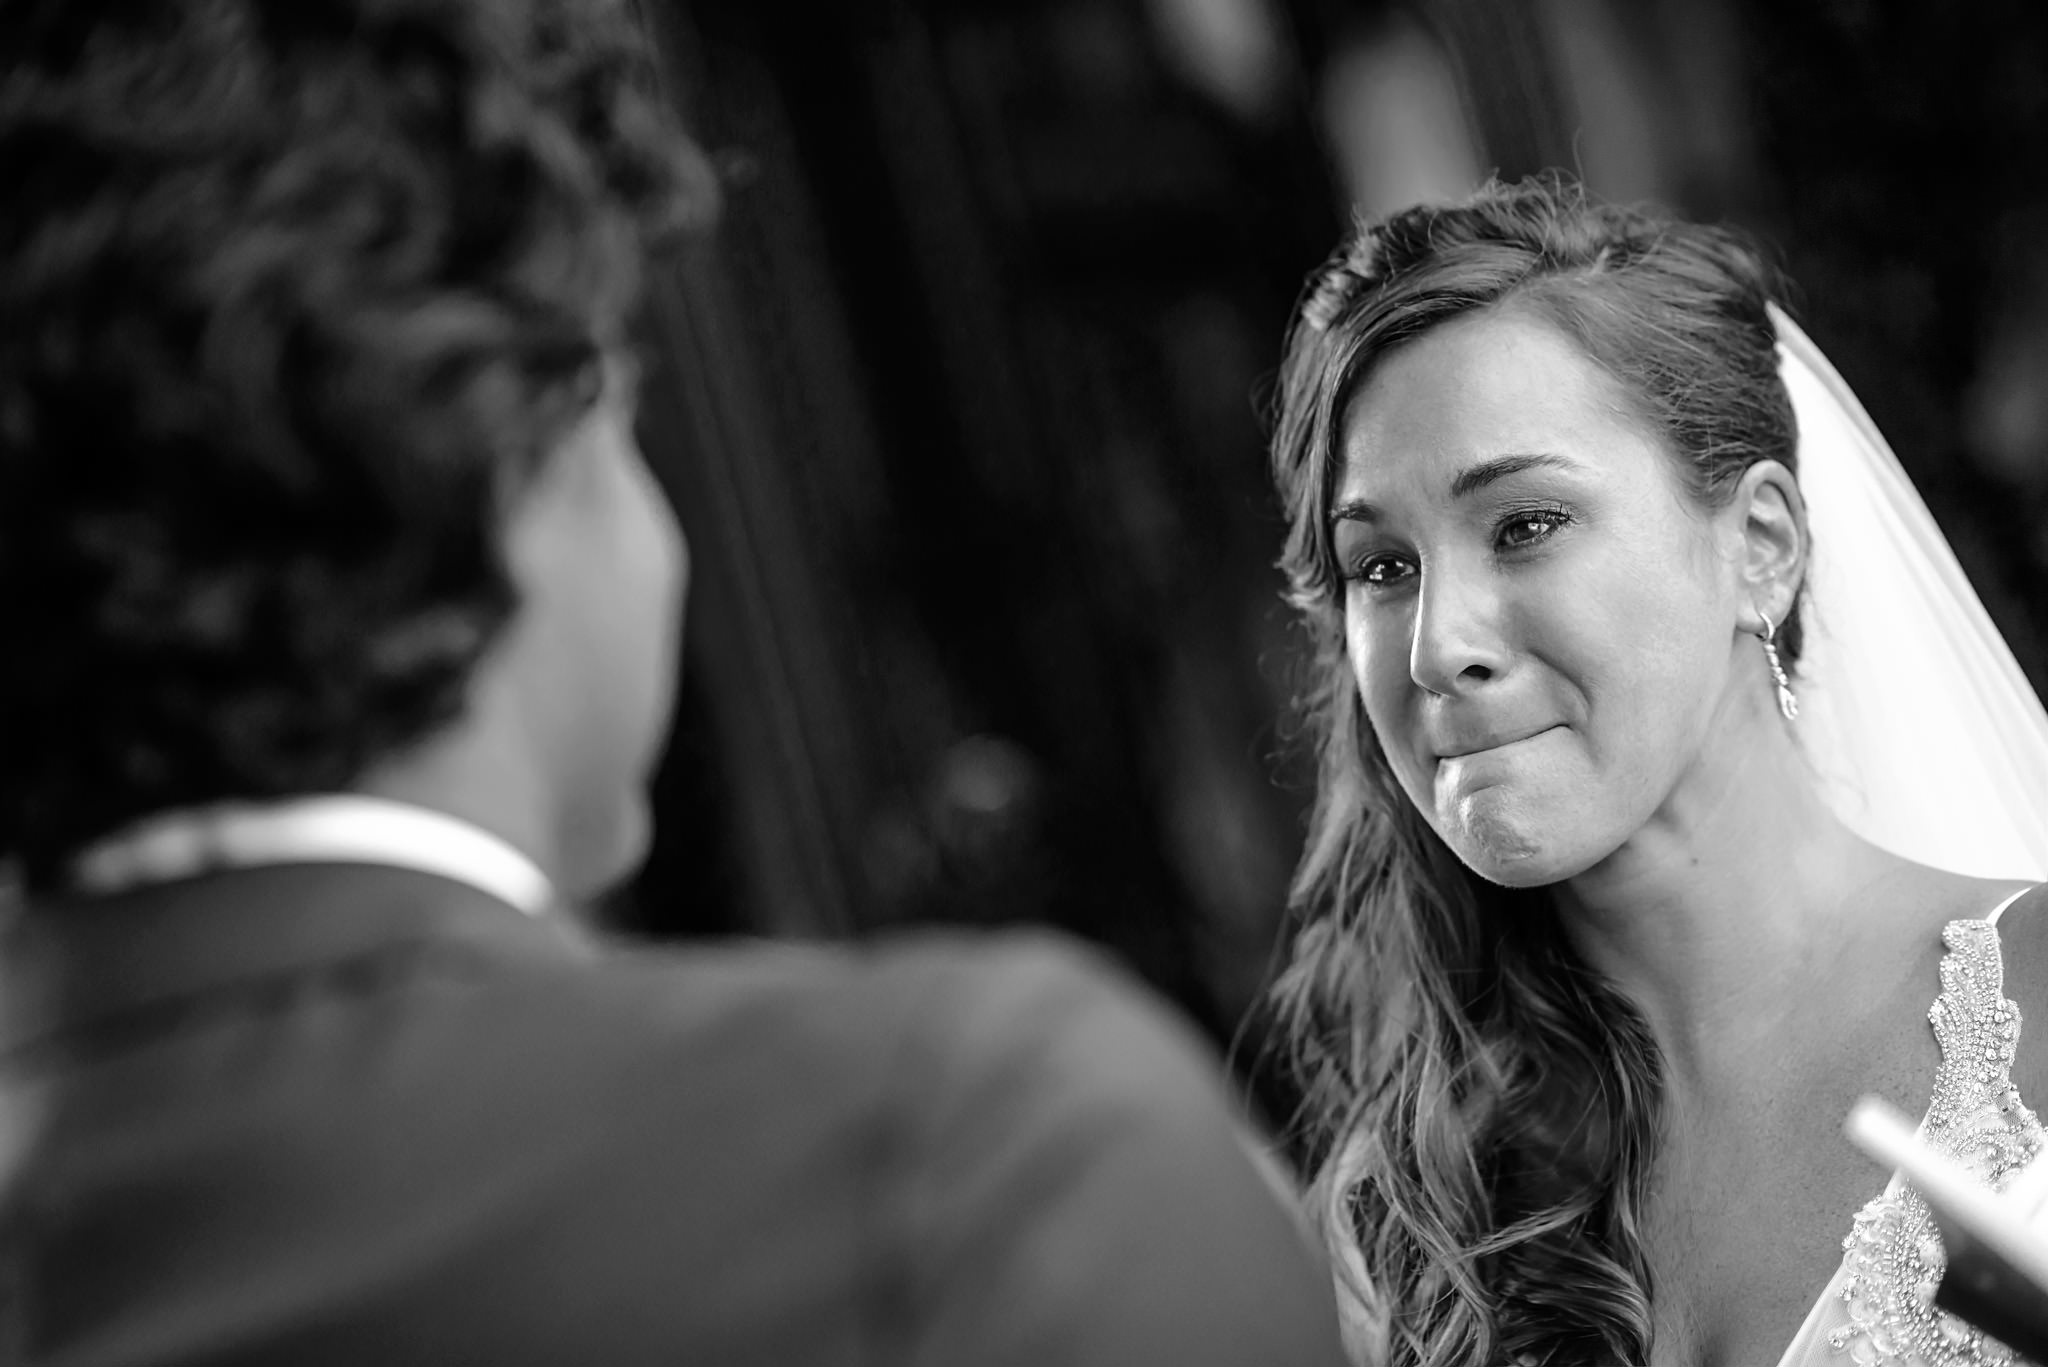 0028-20150610-MaggieDorian-Iribarren-wed